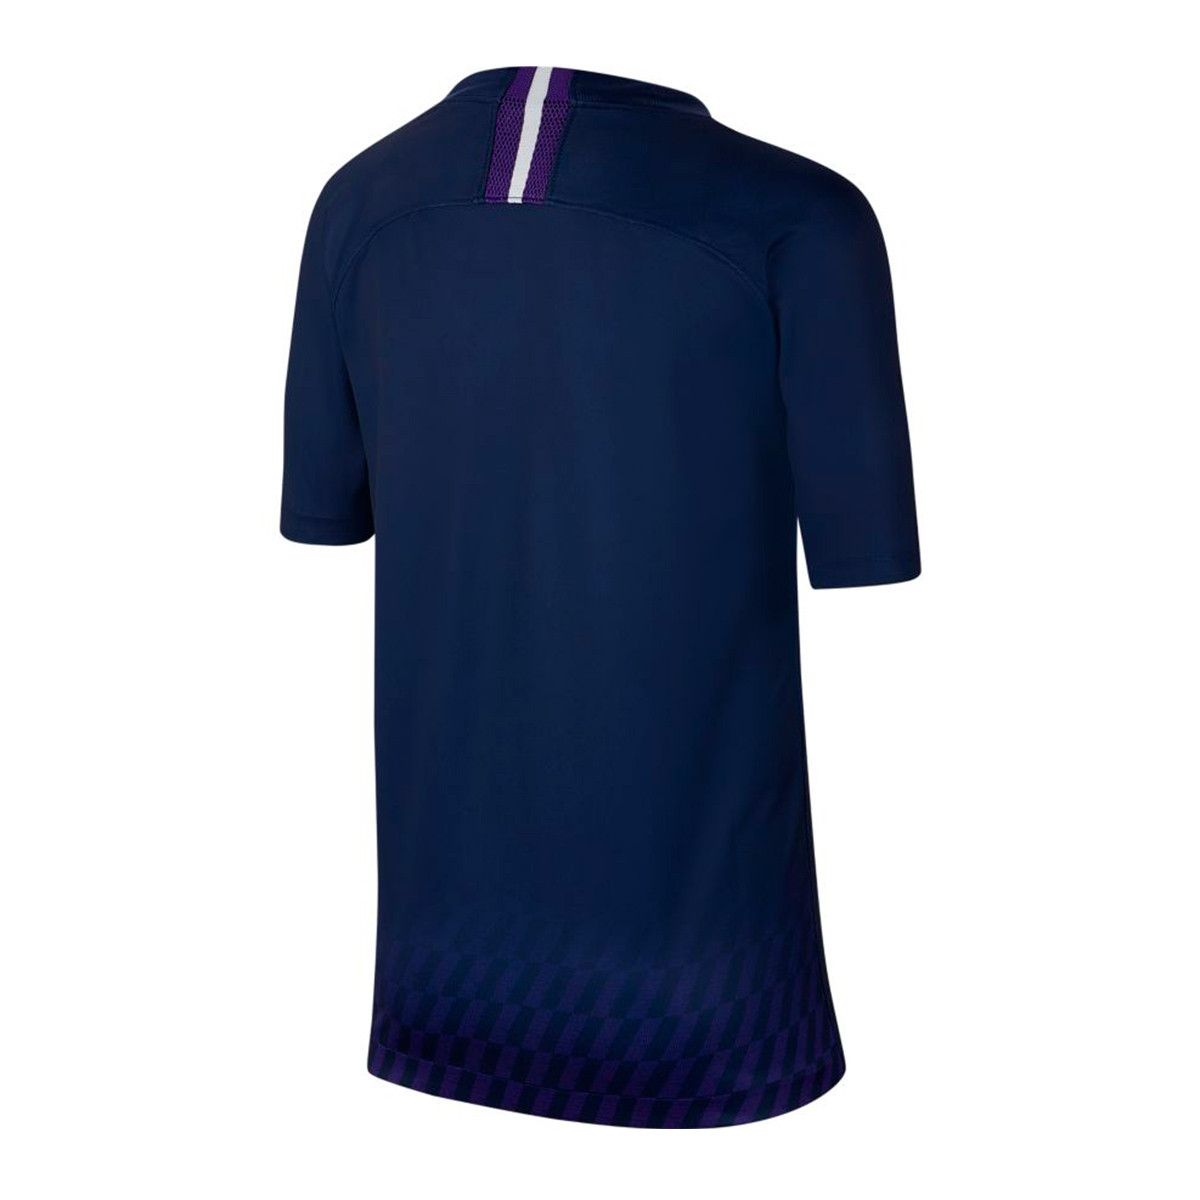 Camisola Nike Tottenham Hotspur Breathe Stadium Equipamento B 2019 2020 Criança